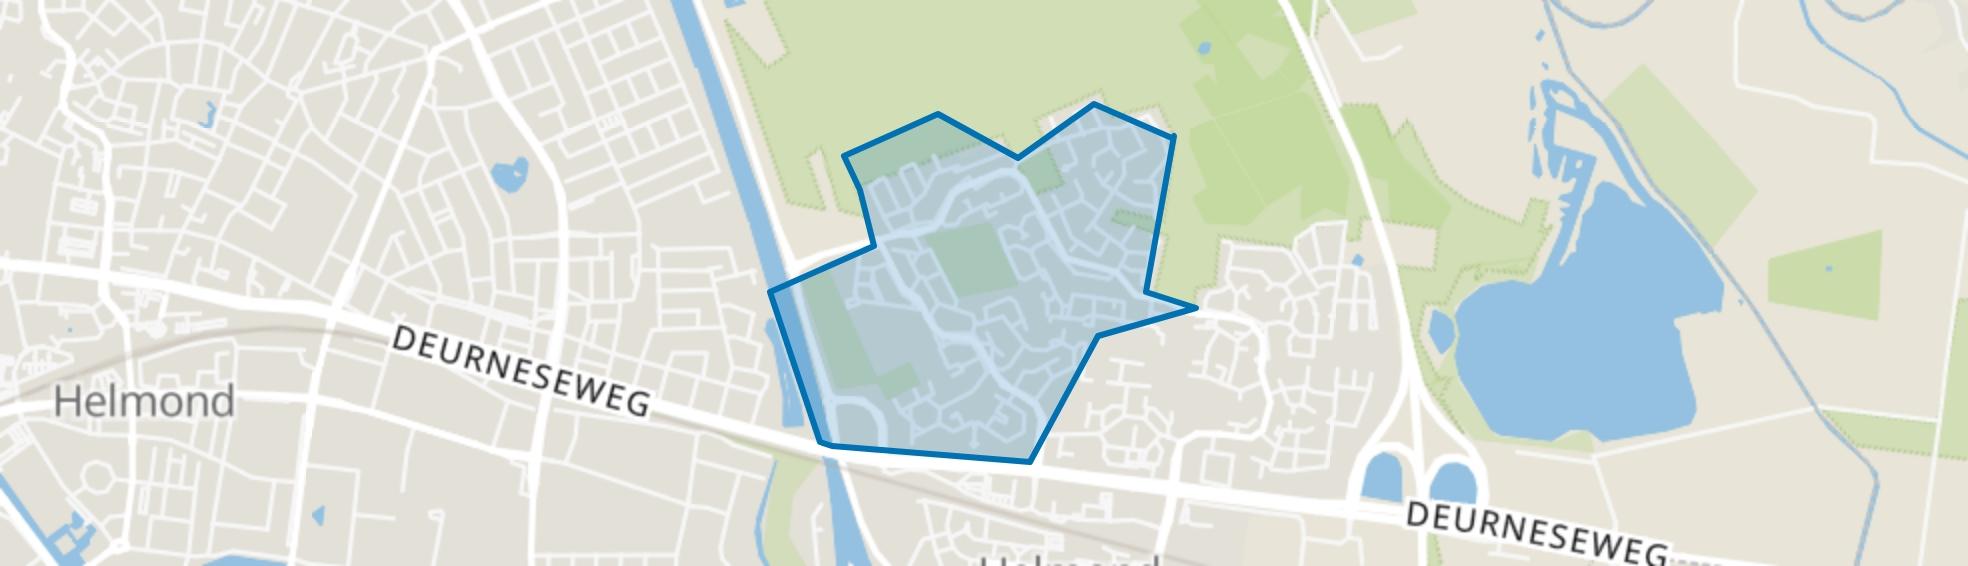 Rijpelberg-West, Helmond map